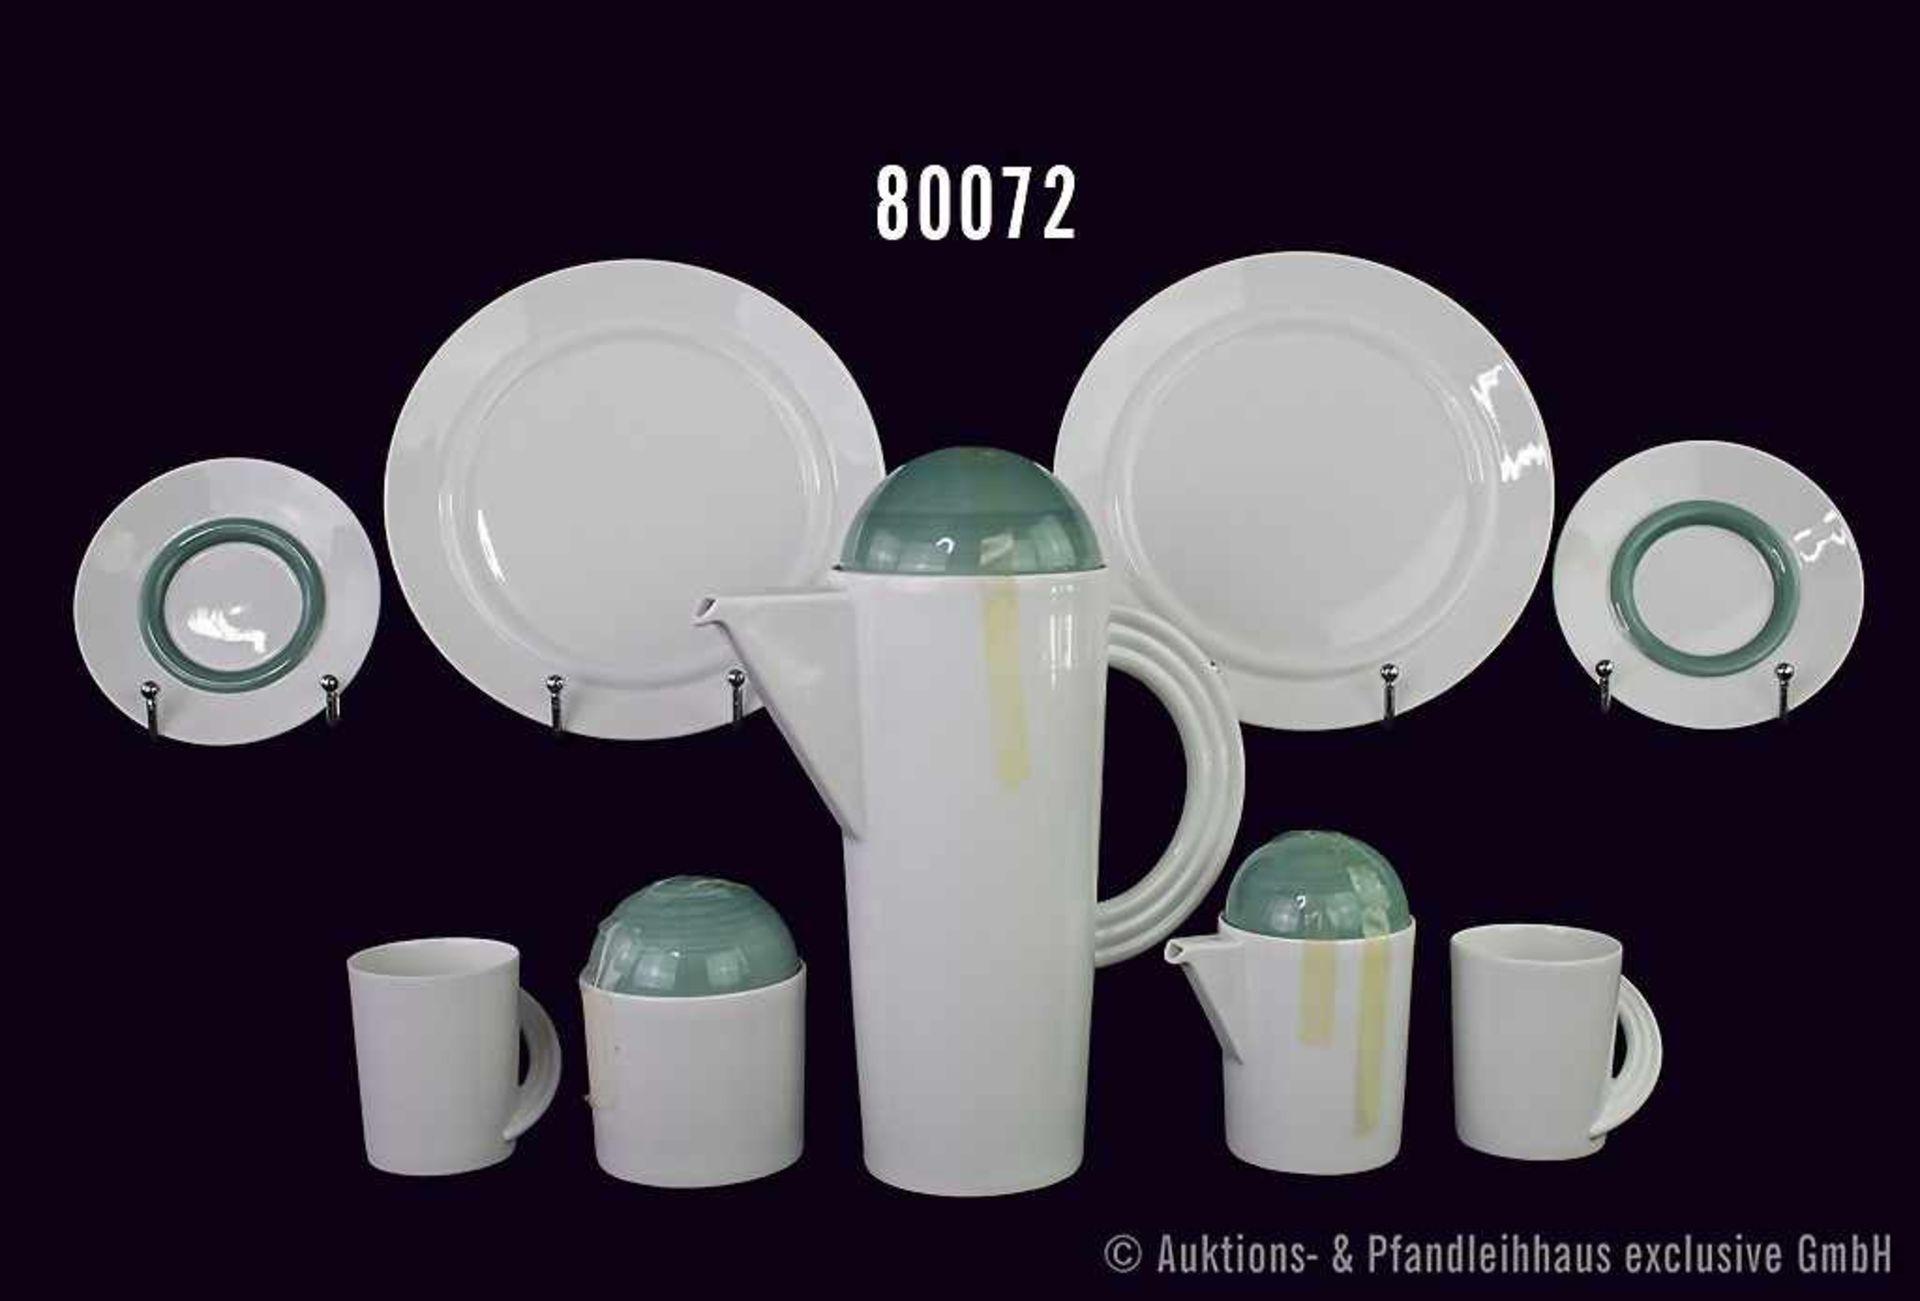 Konv. Rosenthal Porzellan, Kaffee-Service 6-teilig, Cupola (Form 18600), Dekor mintgrün, dabei 1